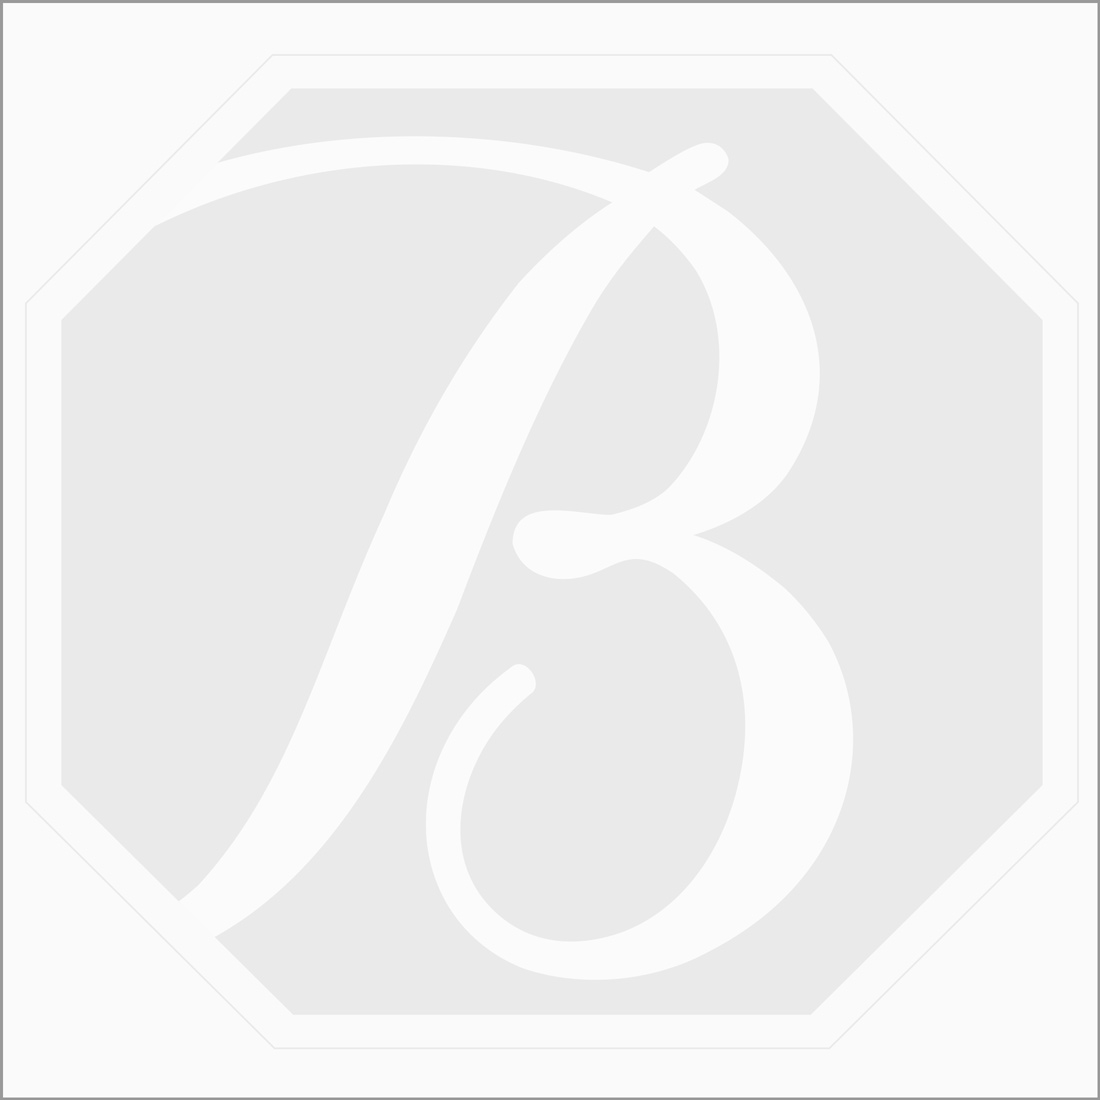 10 x 9.50 mm - Dark Maroon Rose Cut Diamond Cushion Shape - 6.54 carats (FncyDiaRC1020)